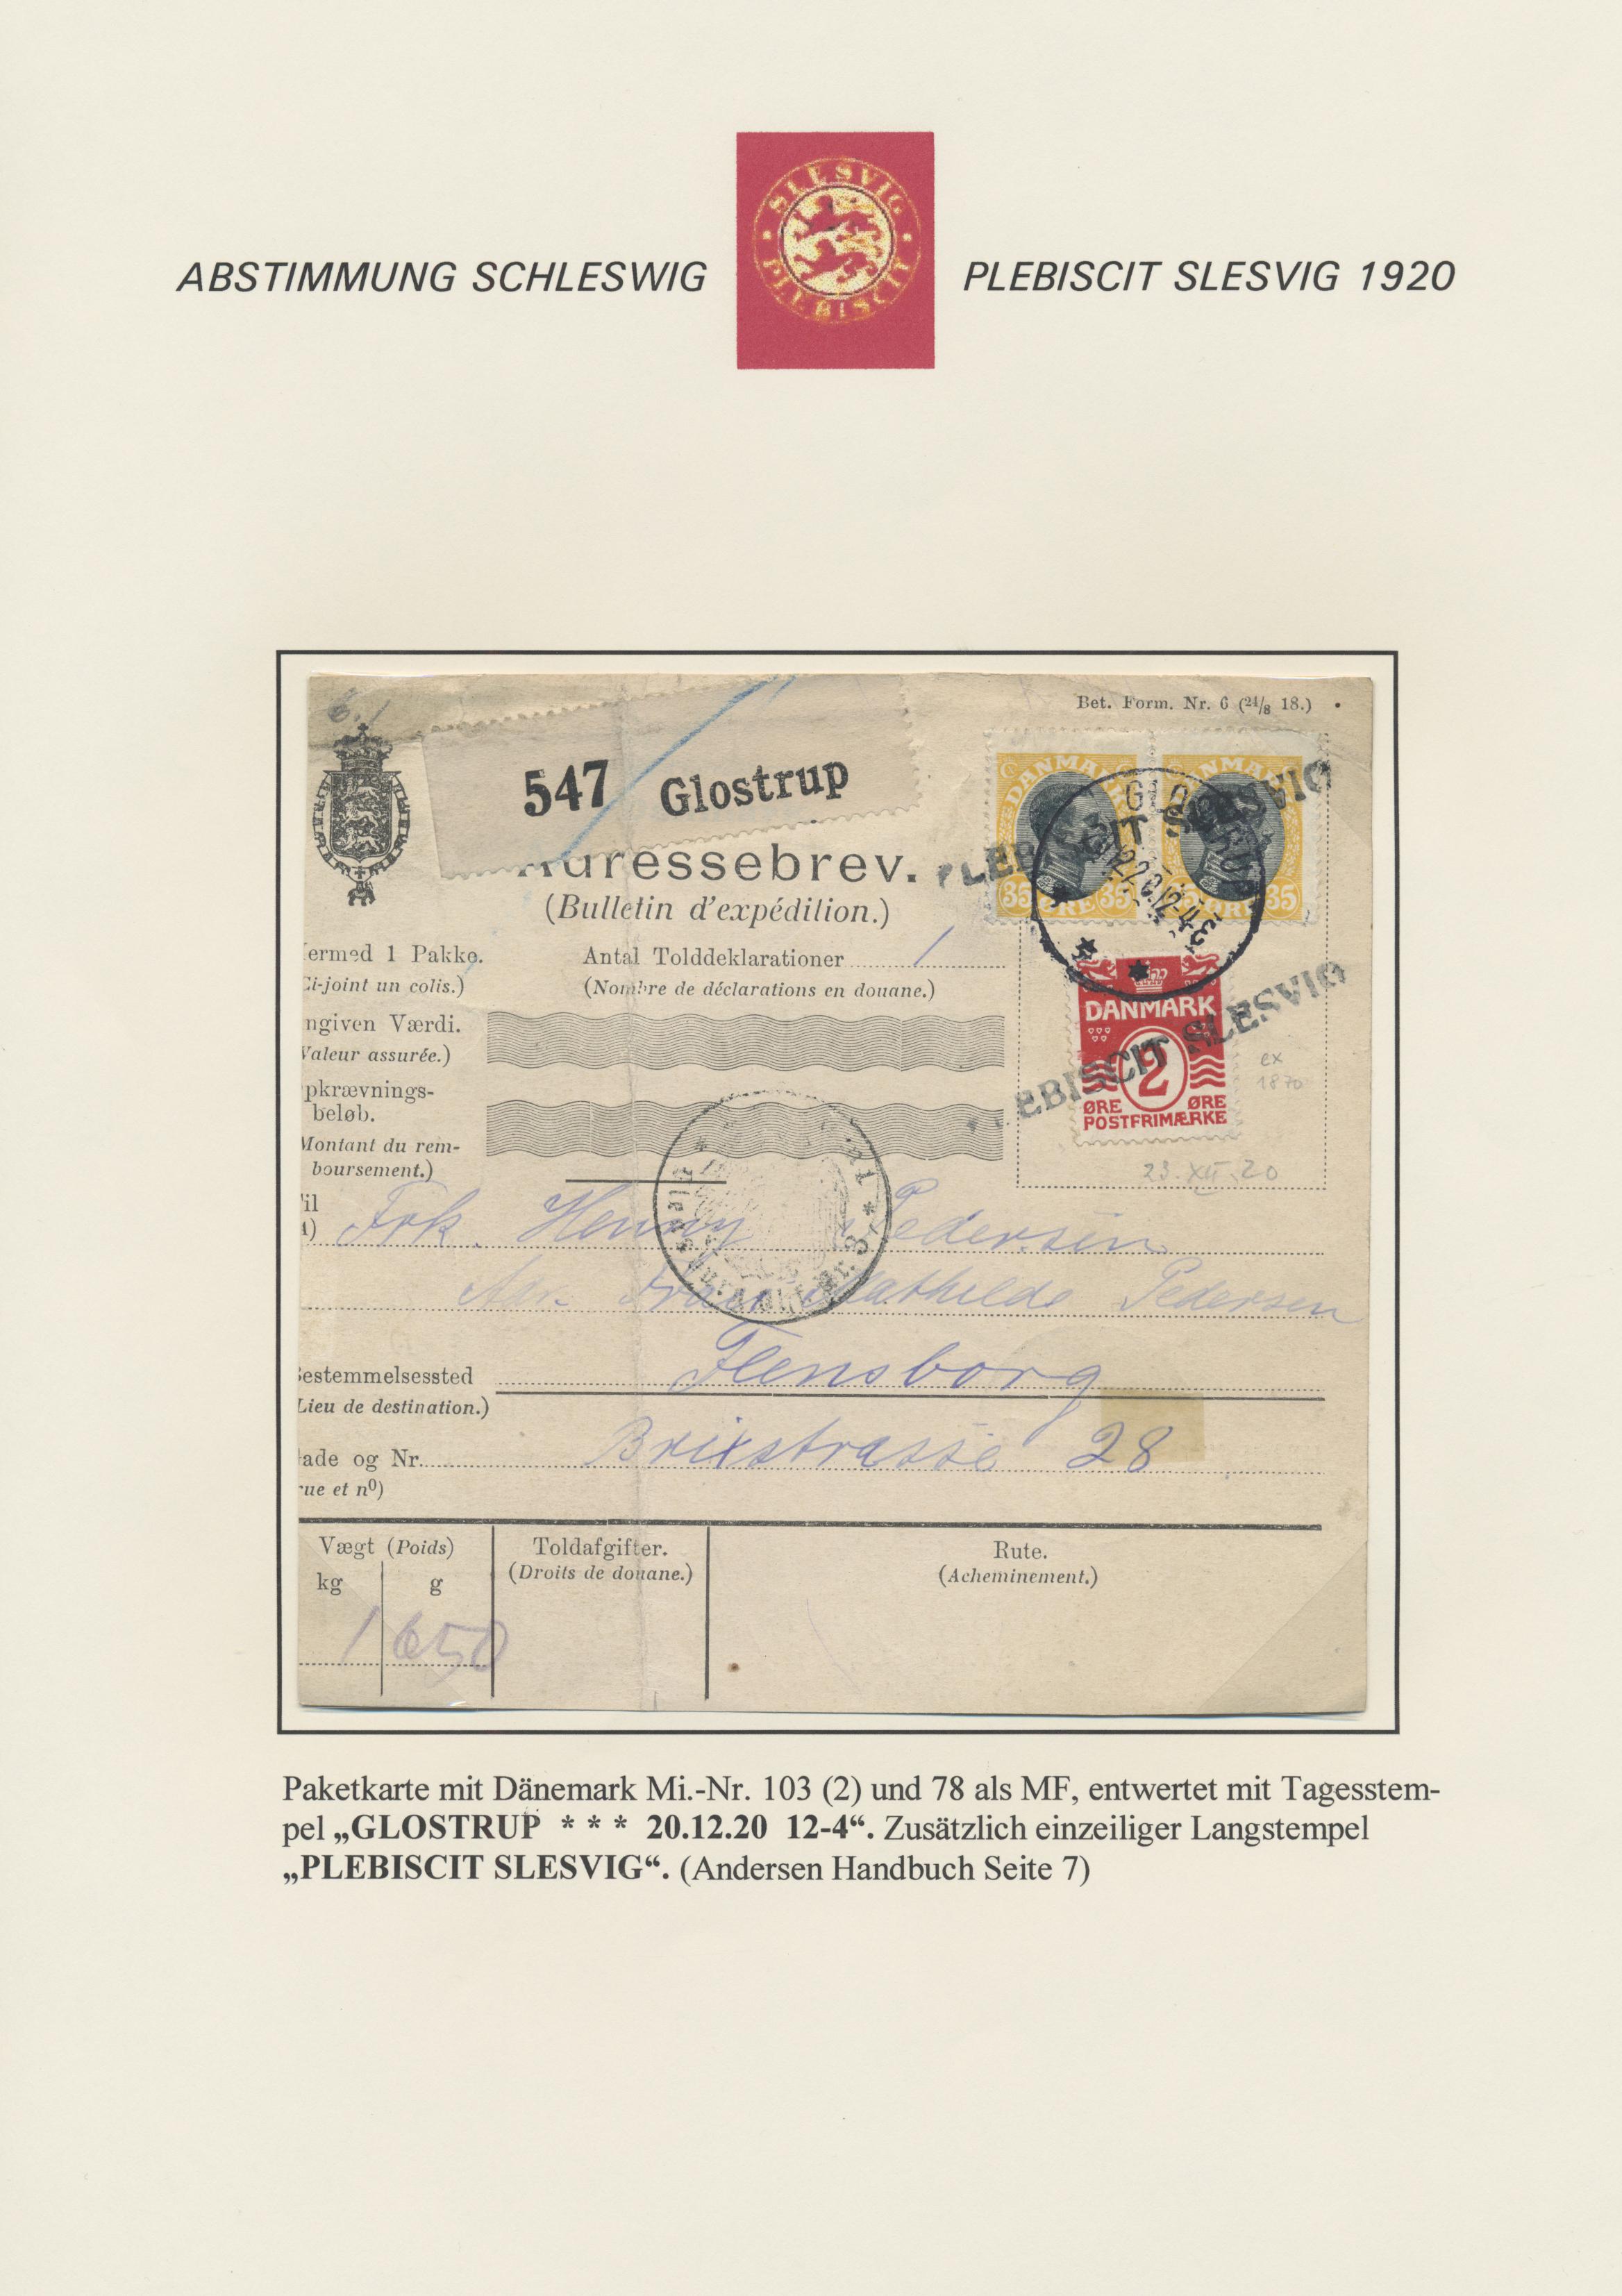 Lot 28886 - Deutsche Abstimmungsgebiete: Schleswig  -  Auktionshaus Christoph Gärtner GmbH & Co. KG Sale #46 Gollcetions Germany - including the suplement